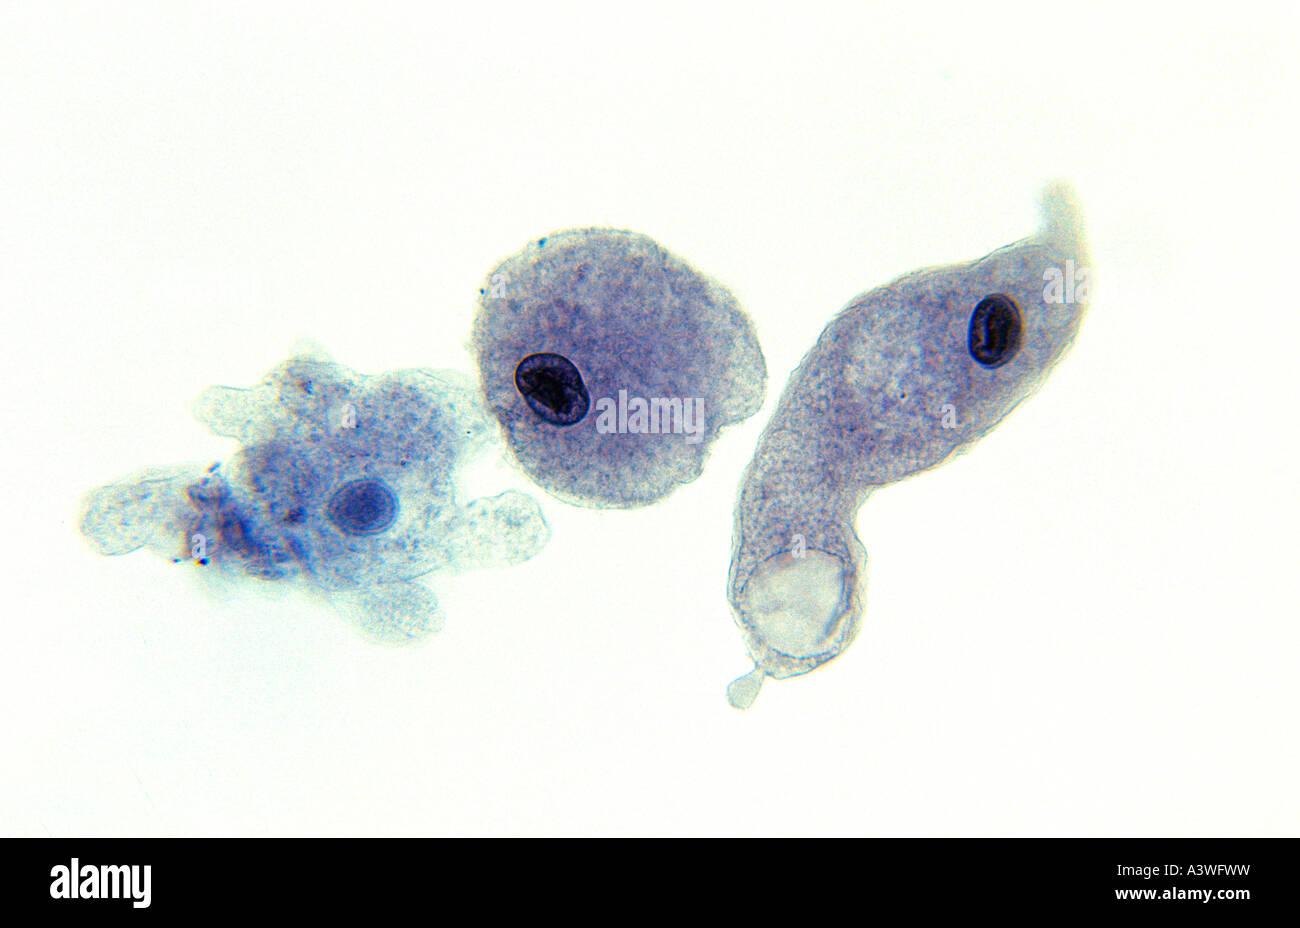 amoeba microscopic photographic technique united kingdom stock photo